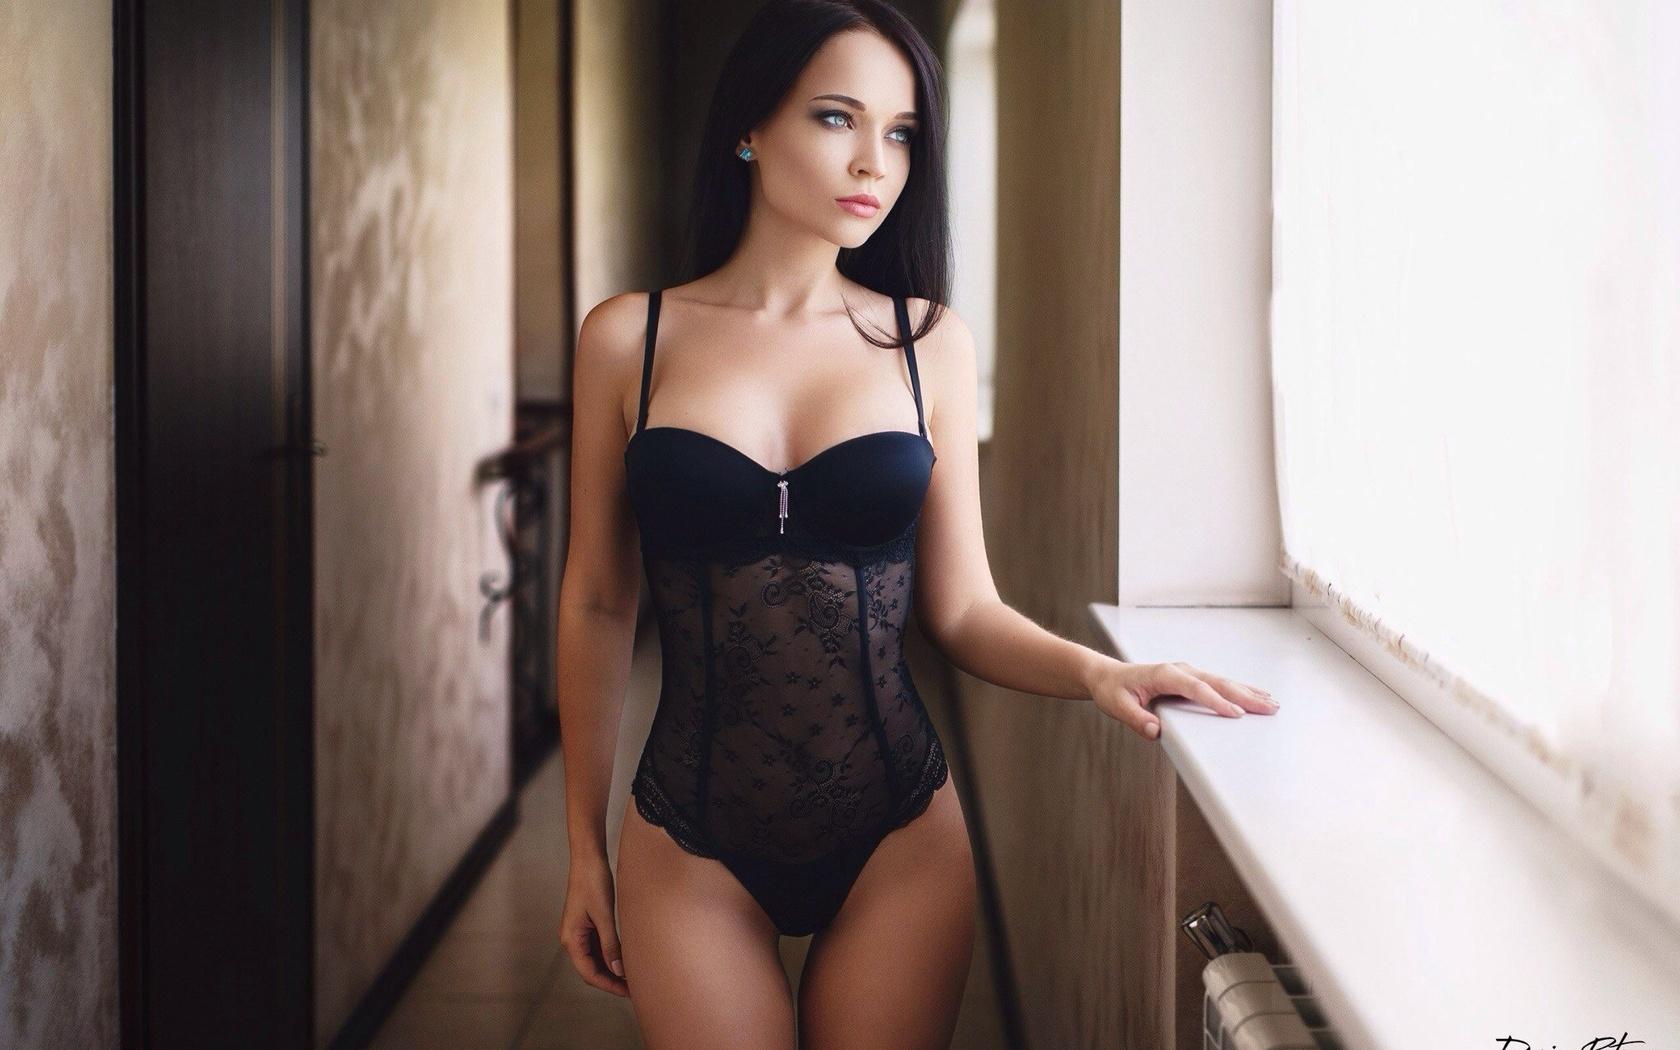 профи фото, девушка, брюнетка, позирует, макро фото, красива, отель, angelina petrova, ангелина петрова, милая